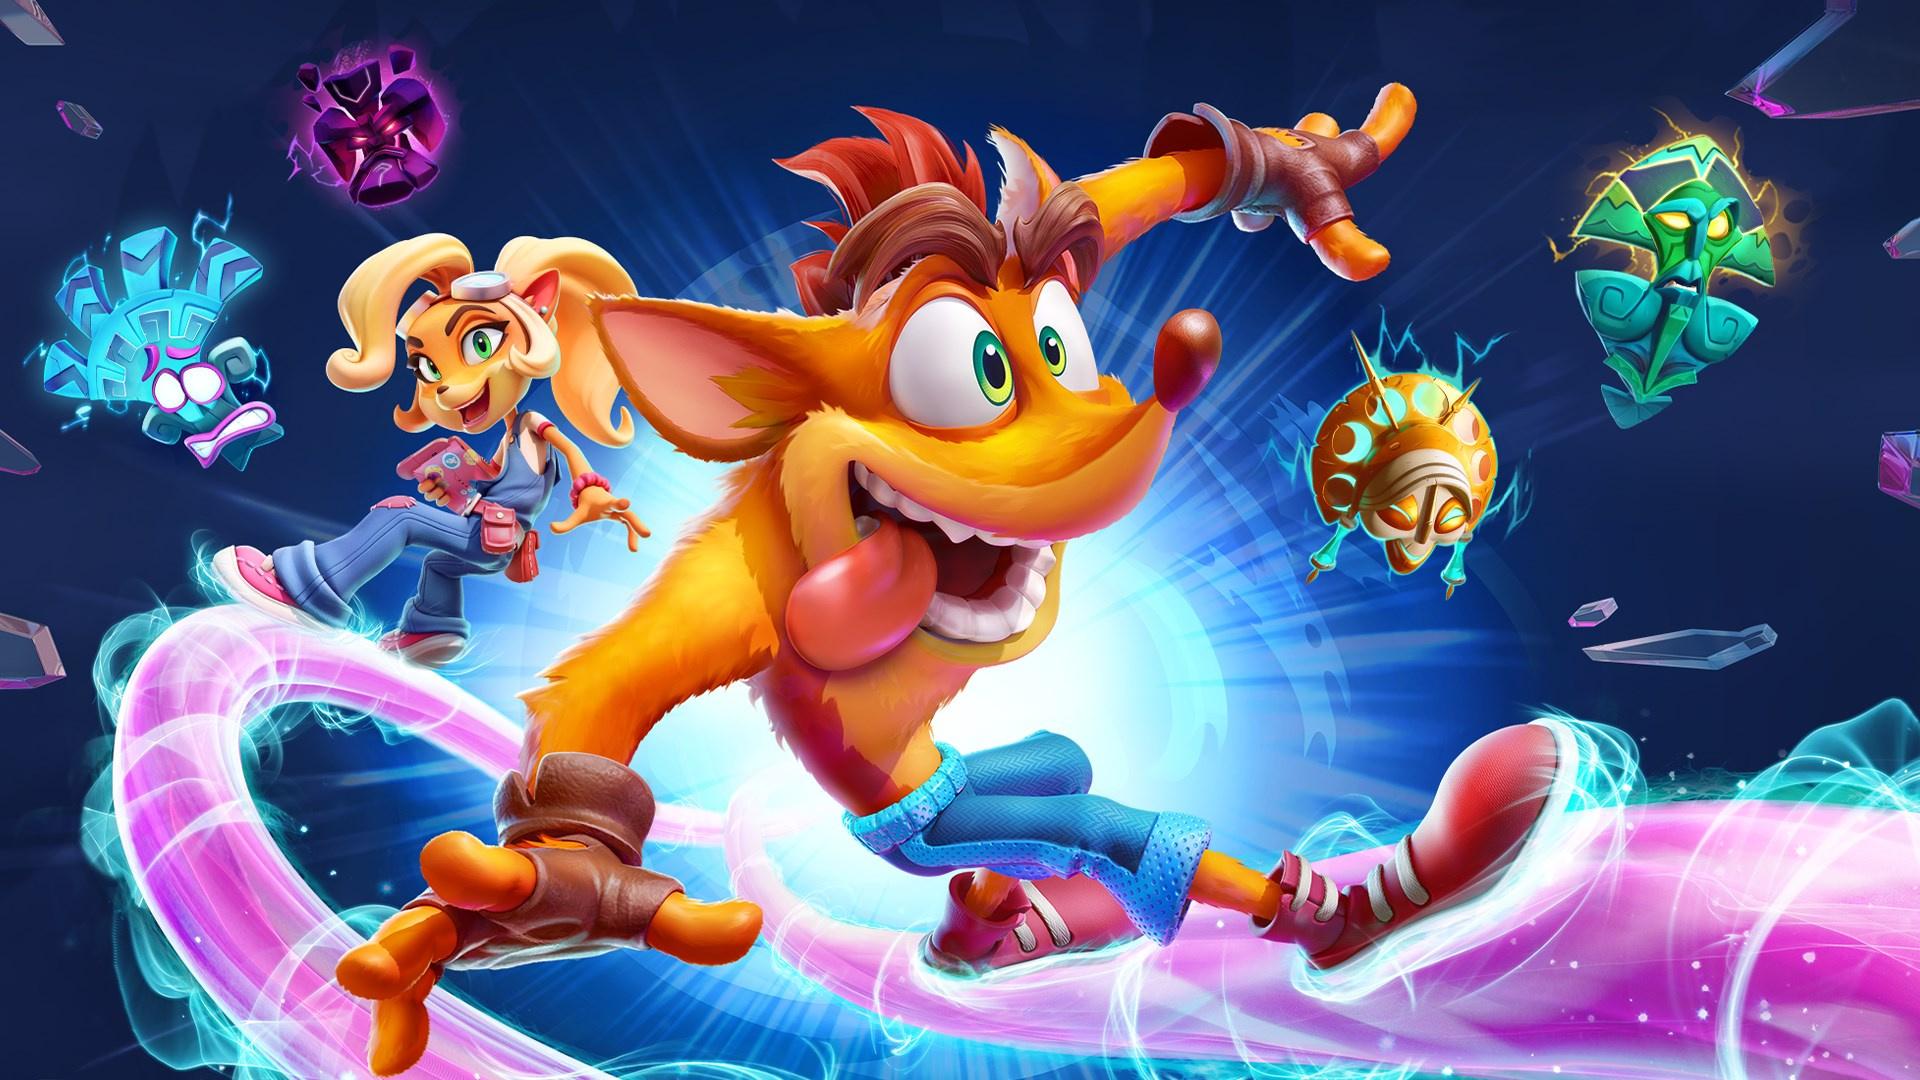 Похоже, Crash Bandicoot 4: It's About Time выйдет на Nintendo Switch и PC